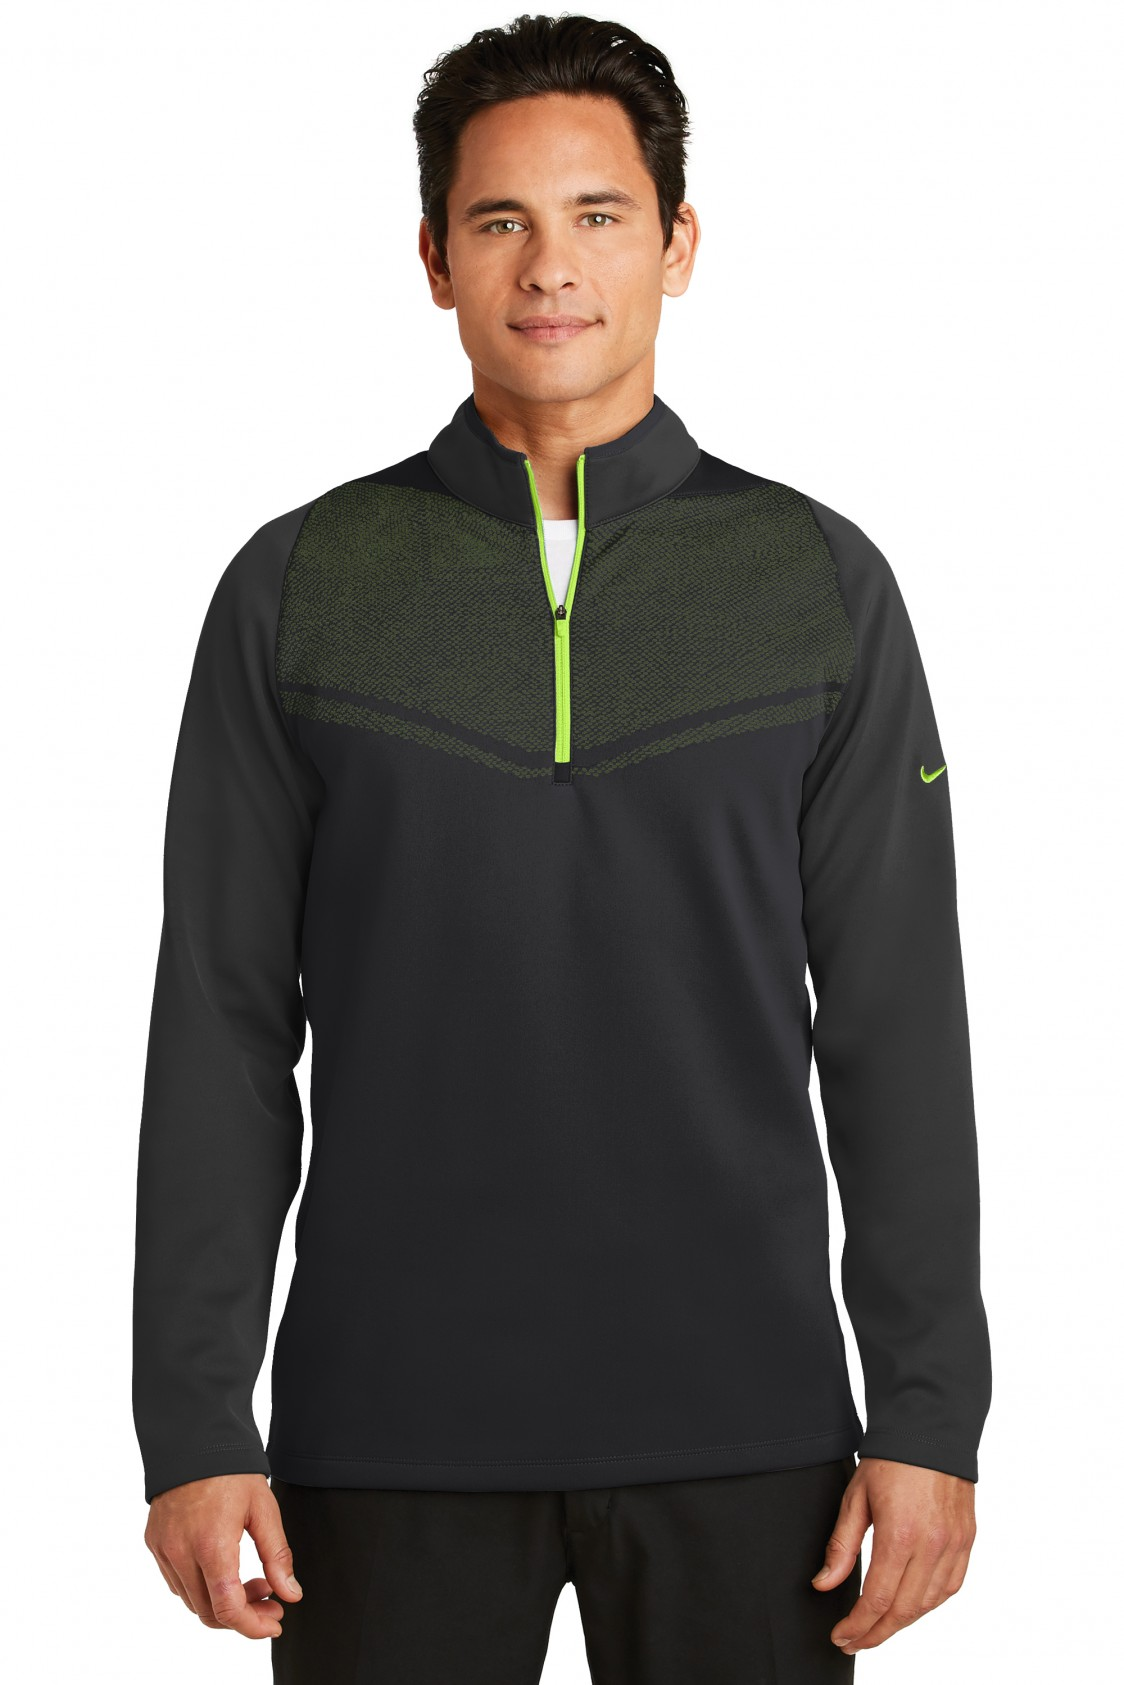 Nike Black/Chartreuse